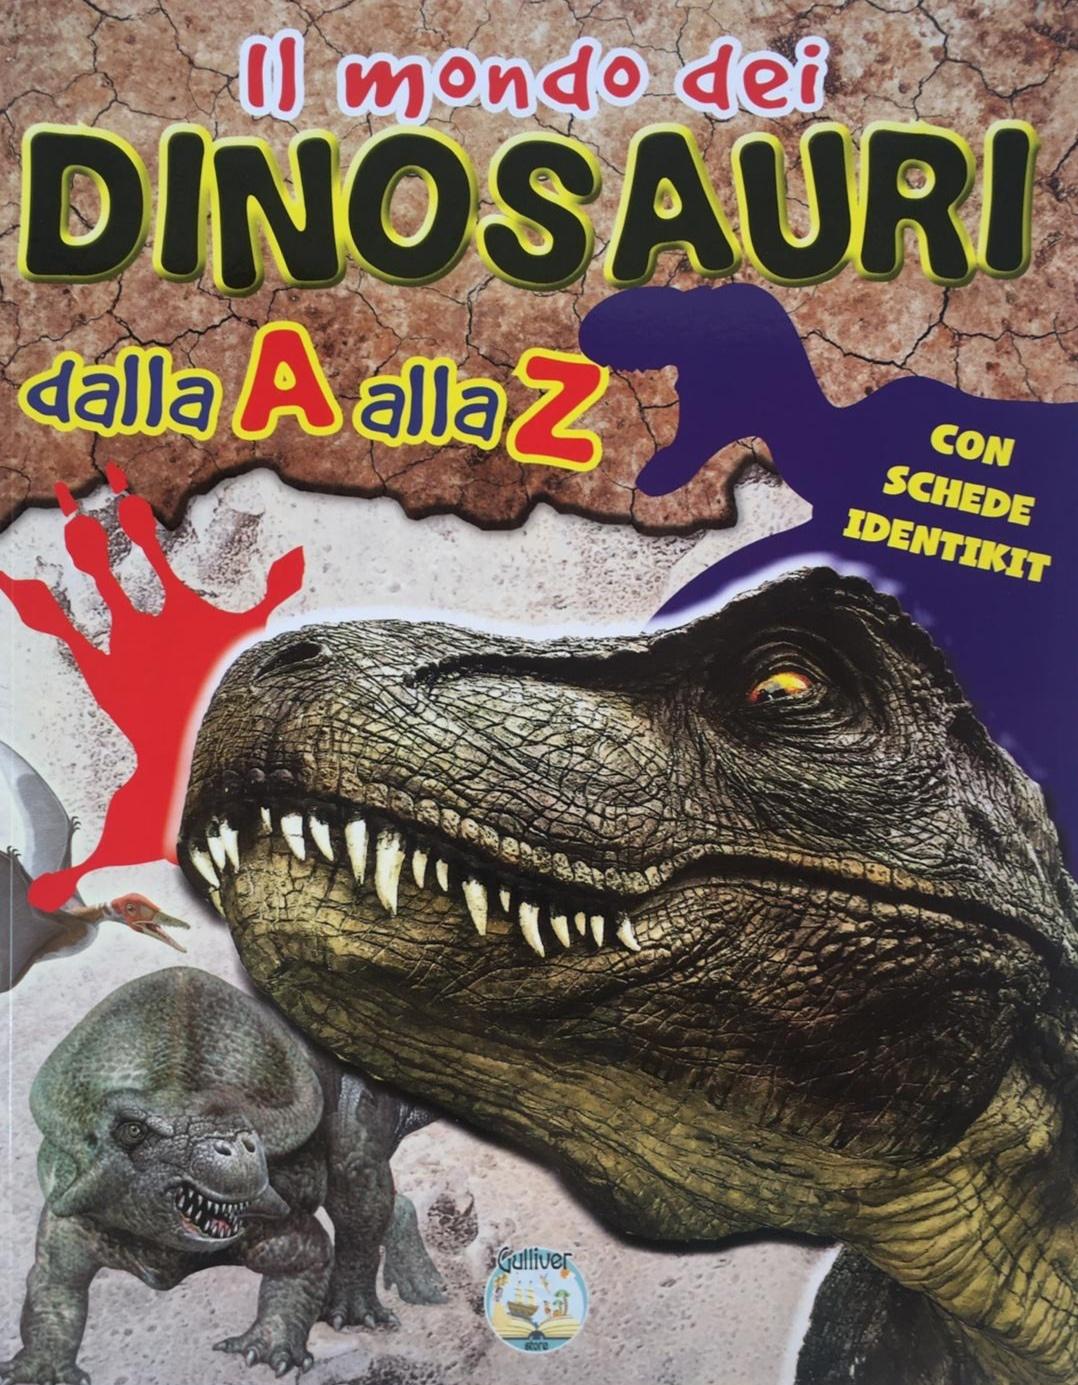 DINOSAURI - Spacebook.it - lo store dei libri online